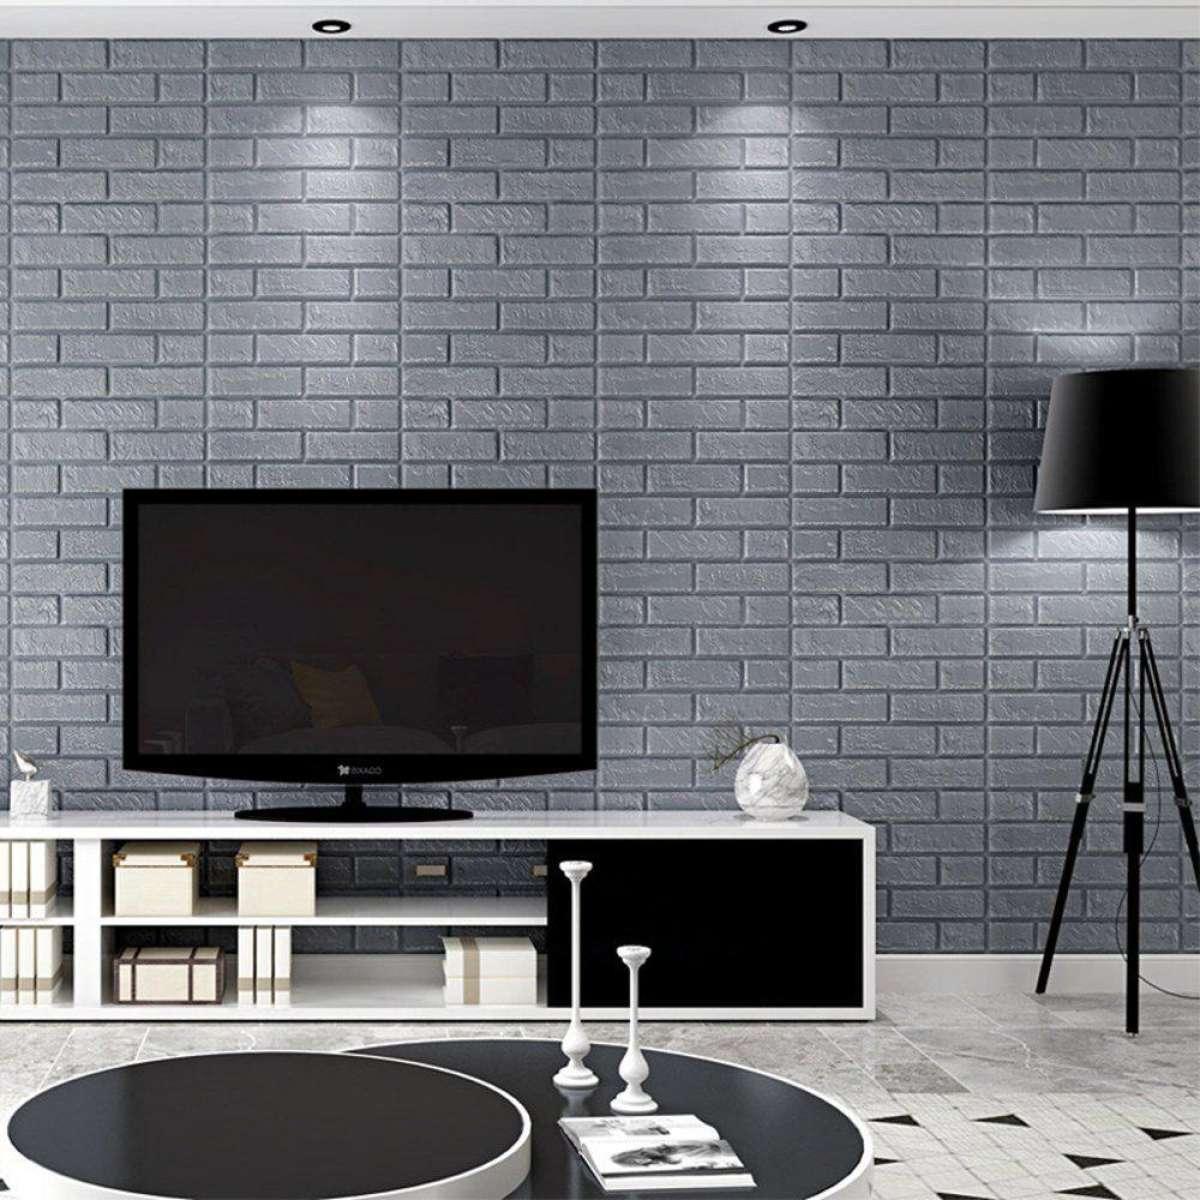 Sk Wallpaper Pe Foam 3d Gray Stone Brick Panel Wall Sticker 70 70cm Home Decor Living Room Wallpaper For Kids Rooms Self Adhesive Diy Art Mural H18